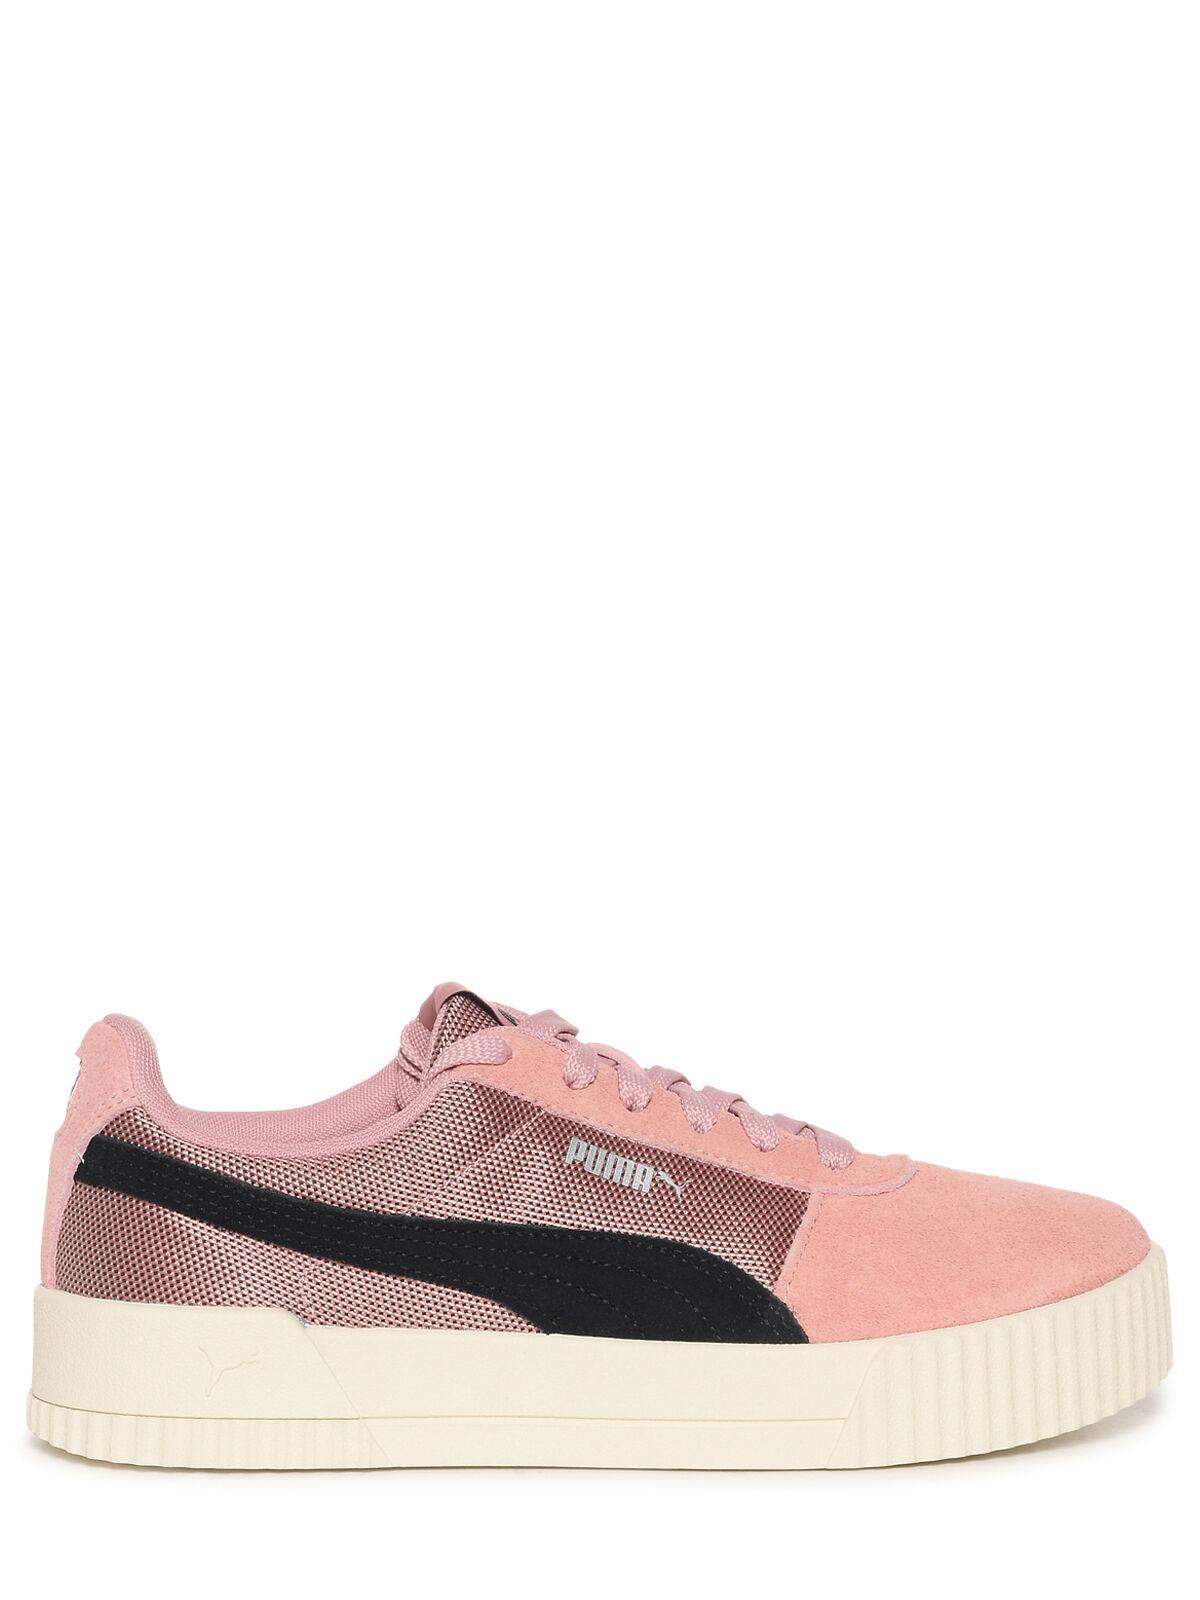 Puma Sneaker Carina Lux SD rosa/schwarz